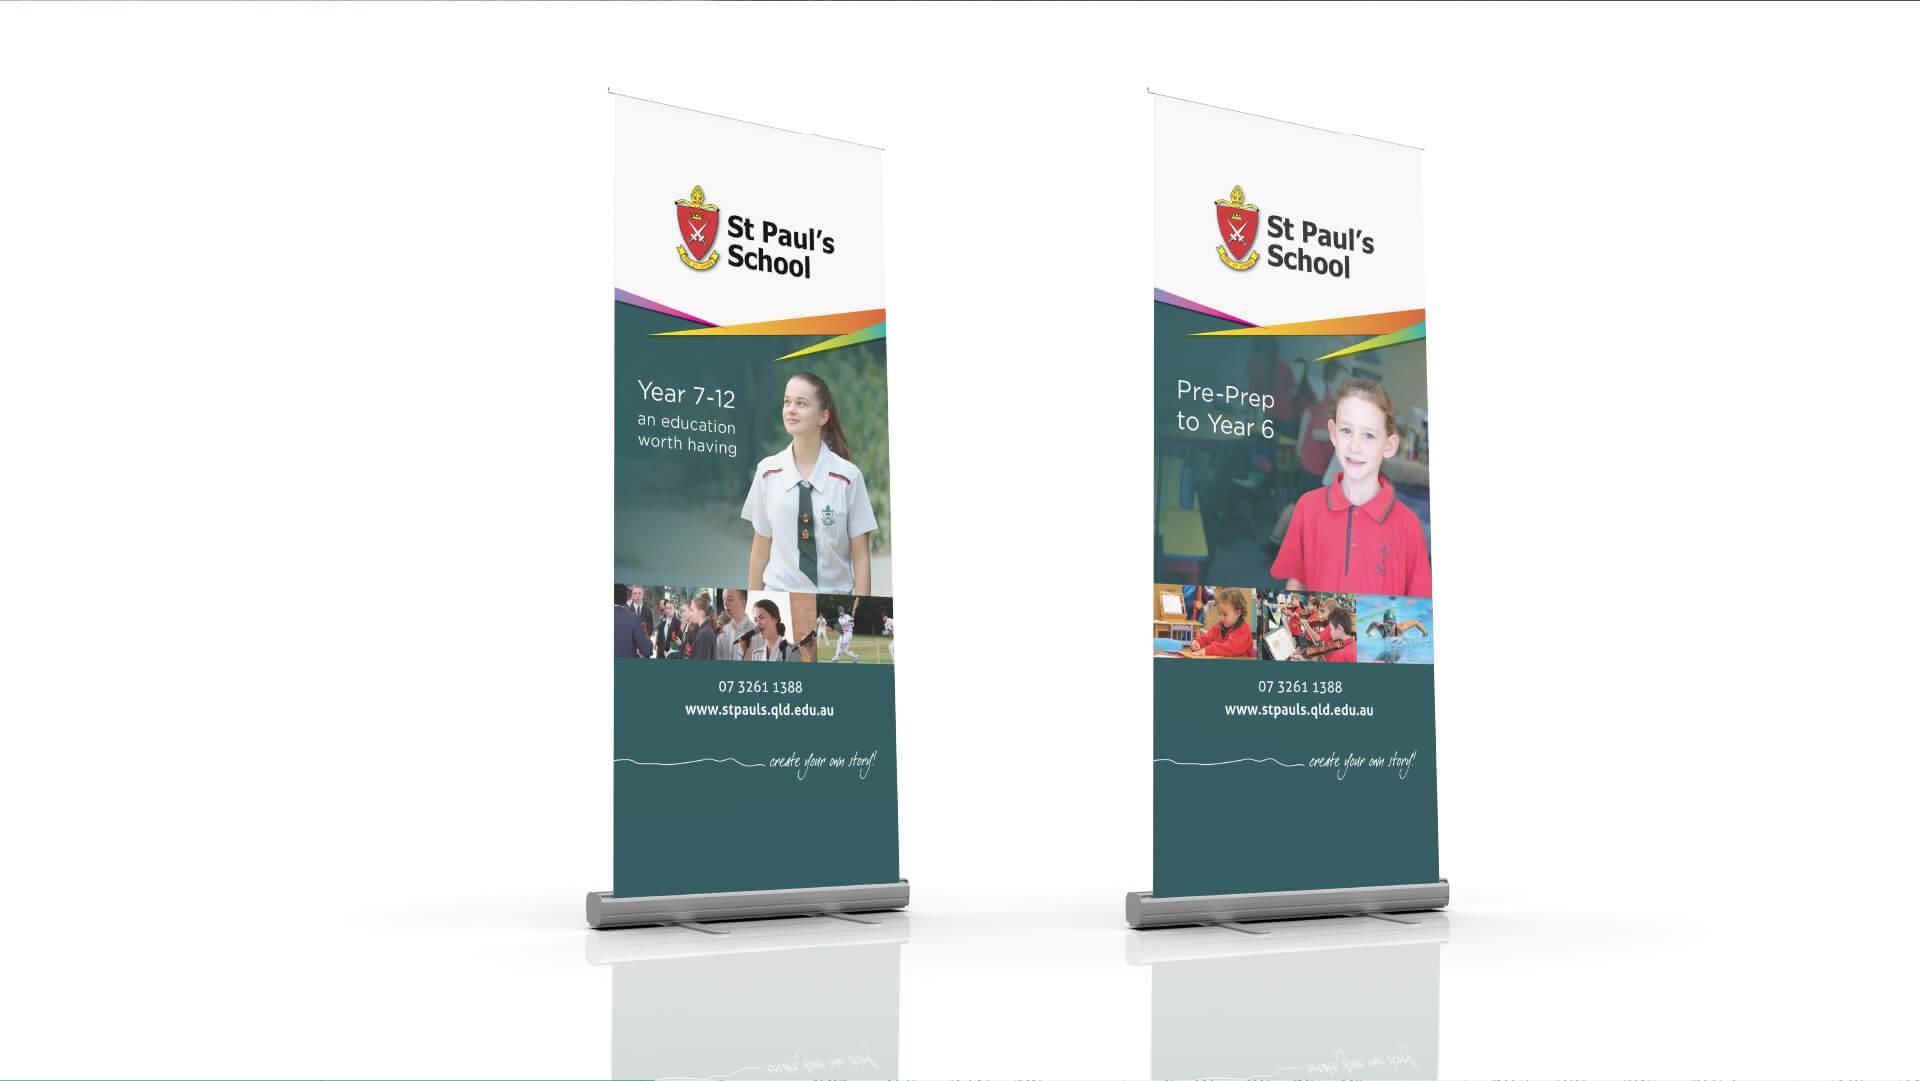 St Pauls School - Education Case Study